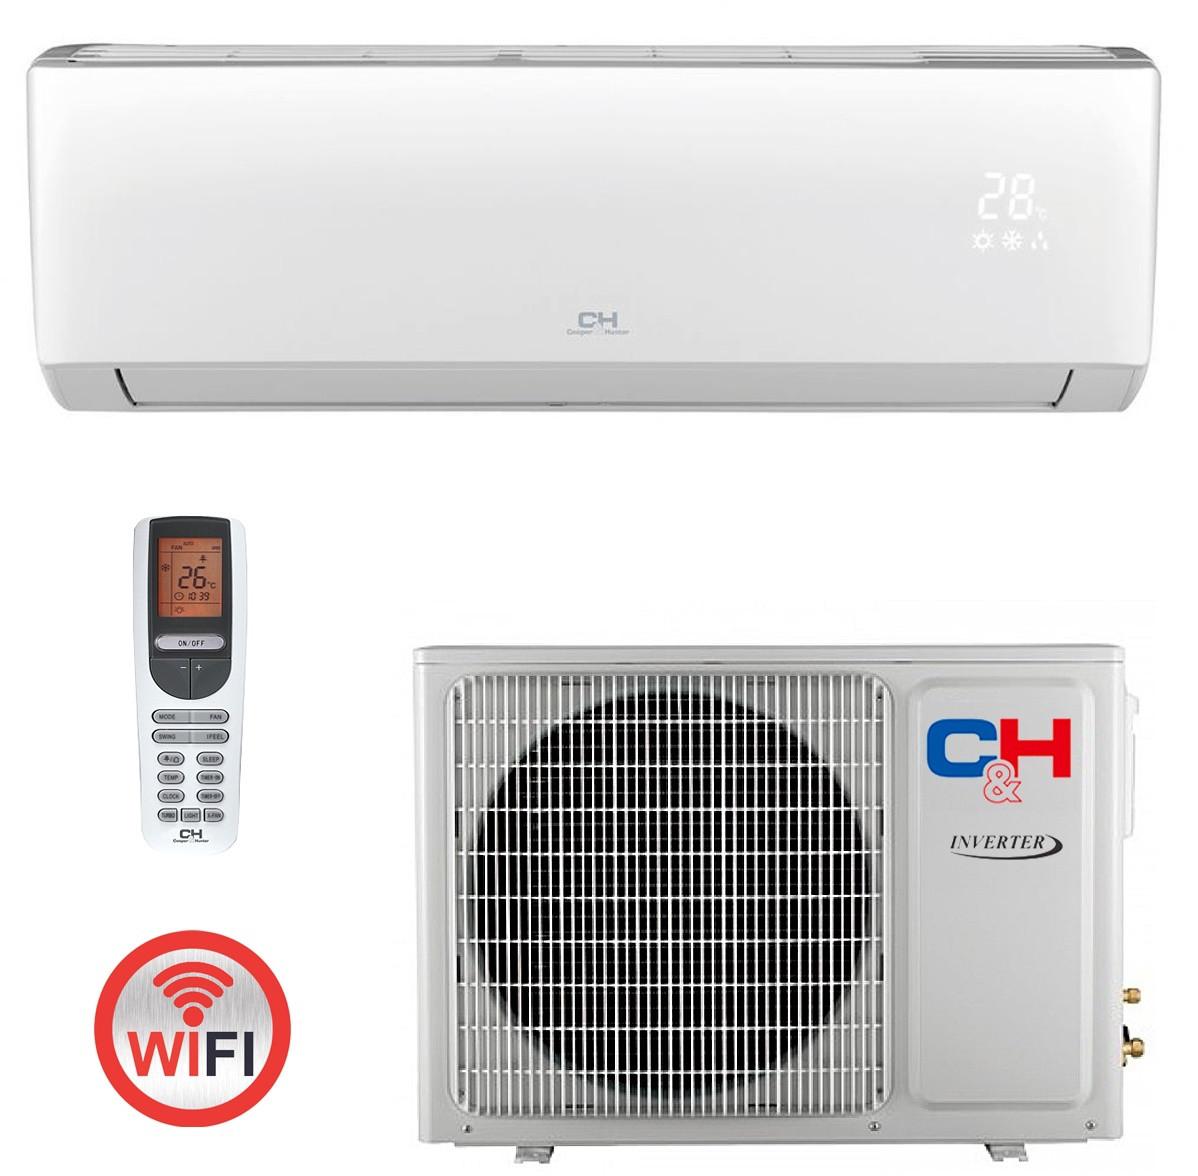 Кондиционер инверторный сплит-система Cooper&Hunter Arctic Inverter CH-S18FTXLA-NG R32 Wi-Fi